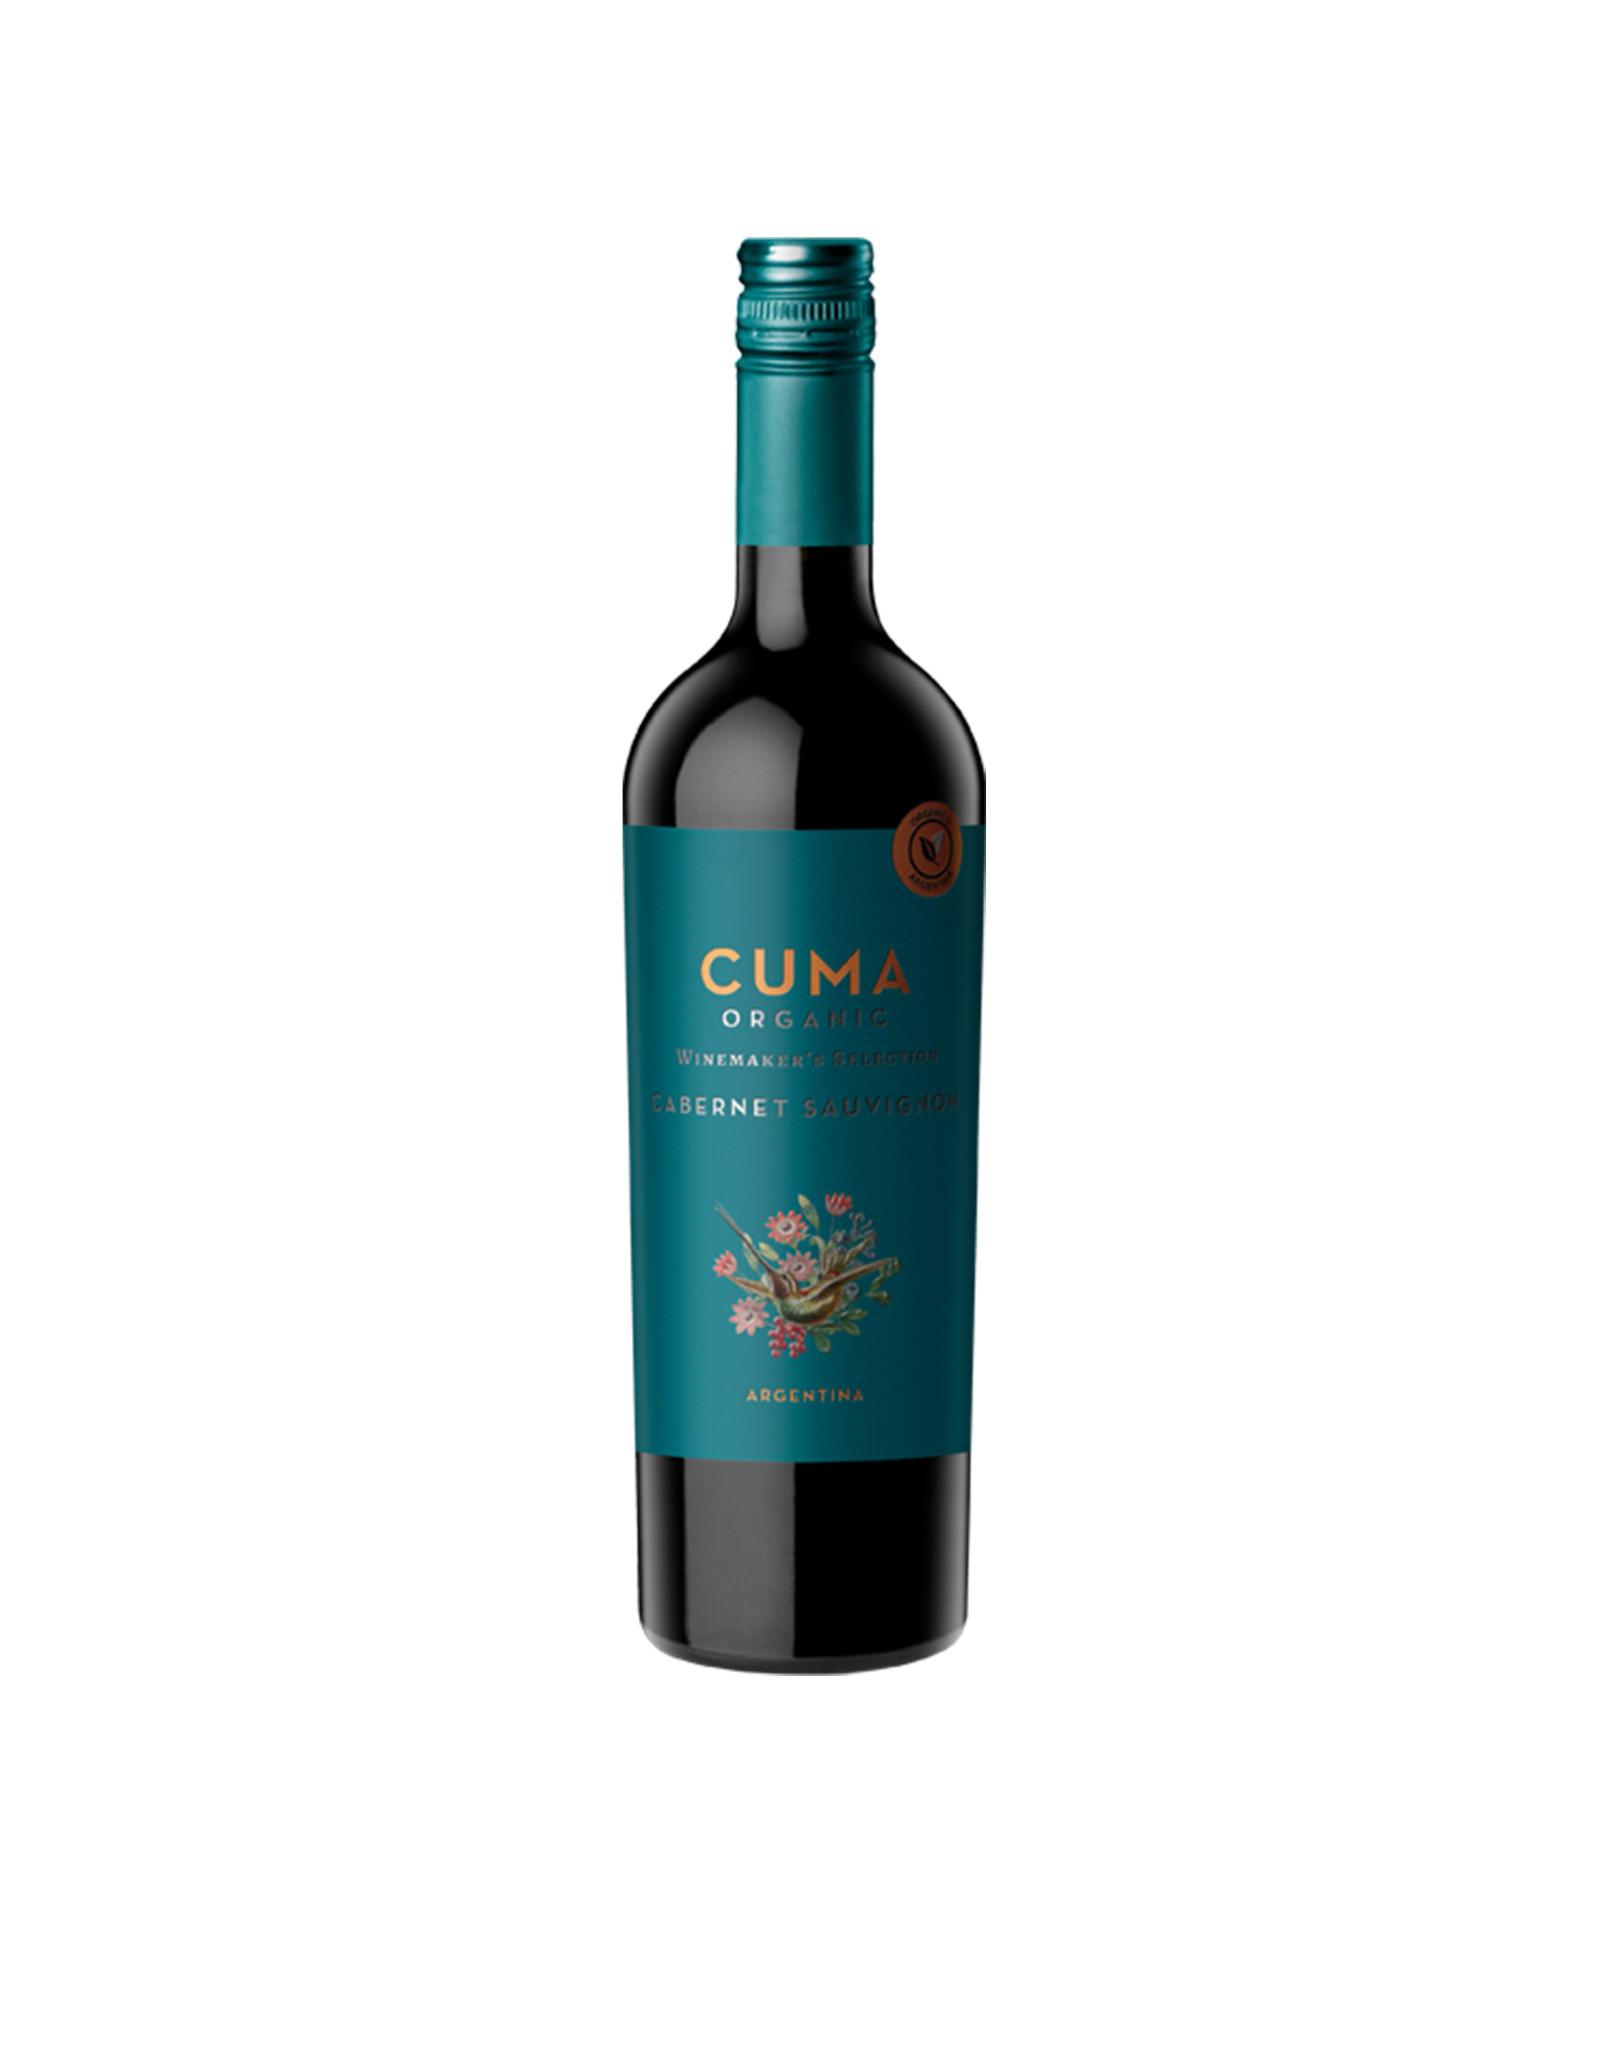 Cuma Cuma, Cabernet Sauvignon 2020 Appellation: Calchaquí Valley, Argentina